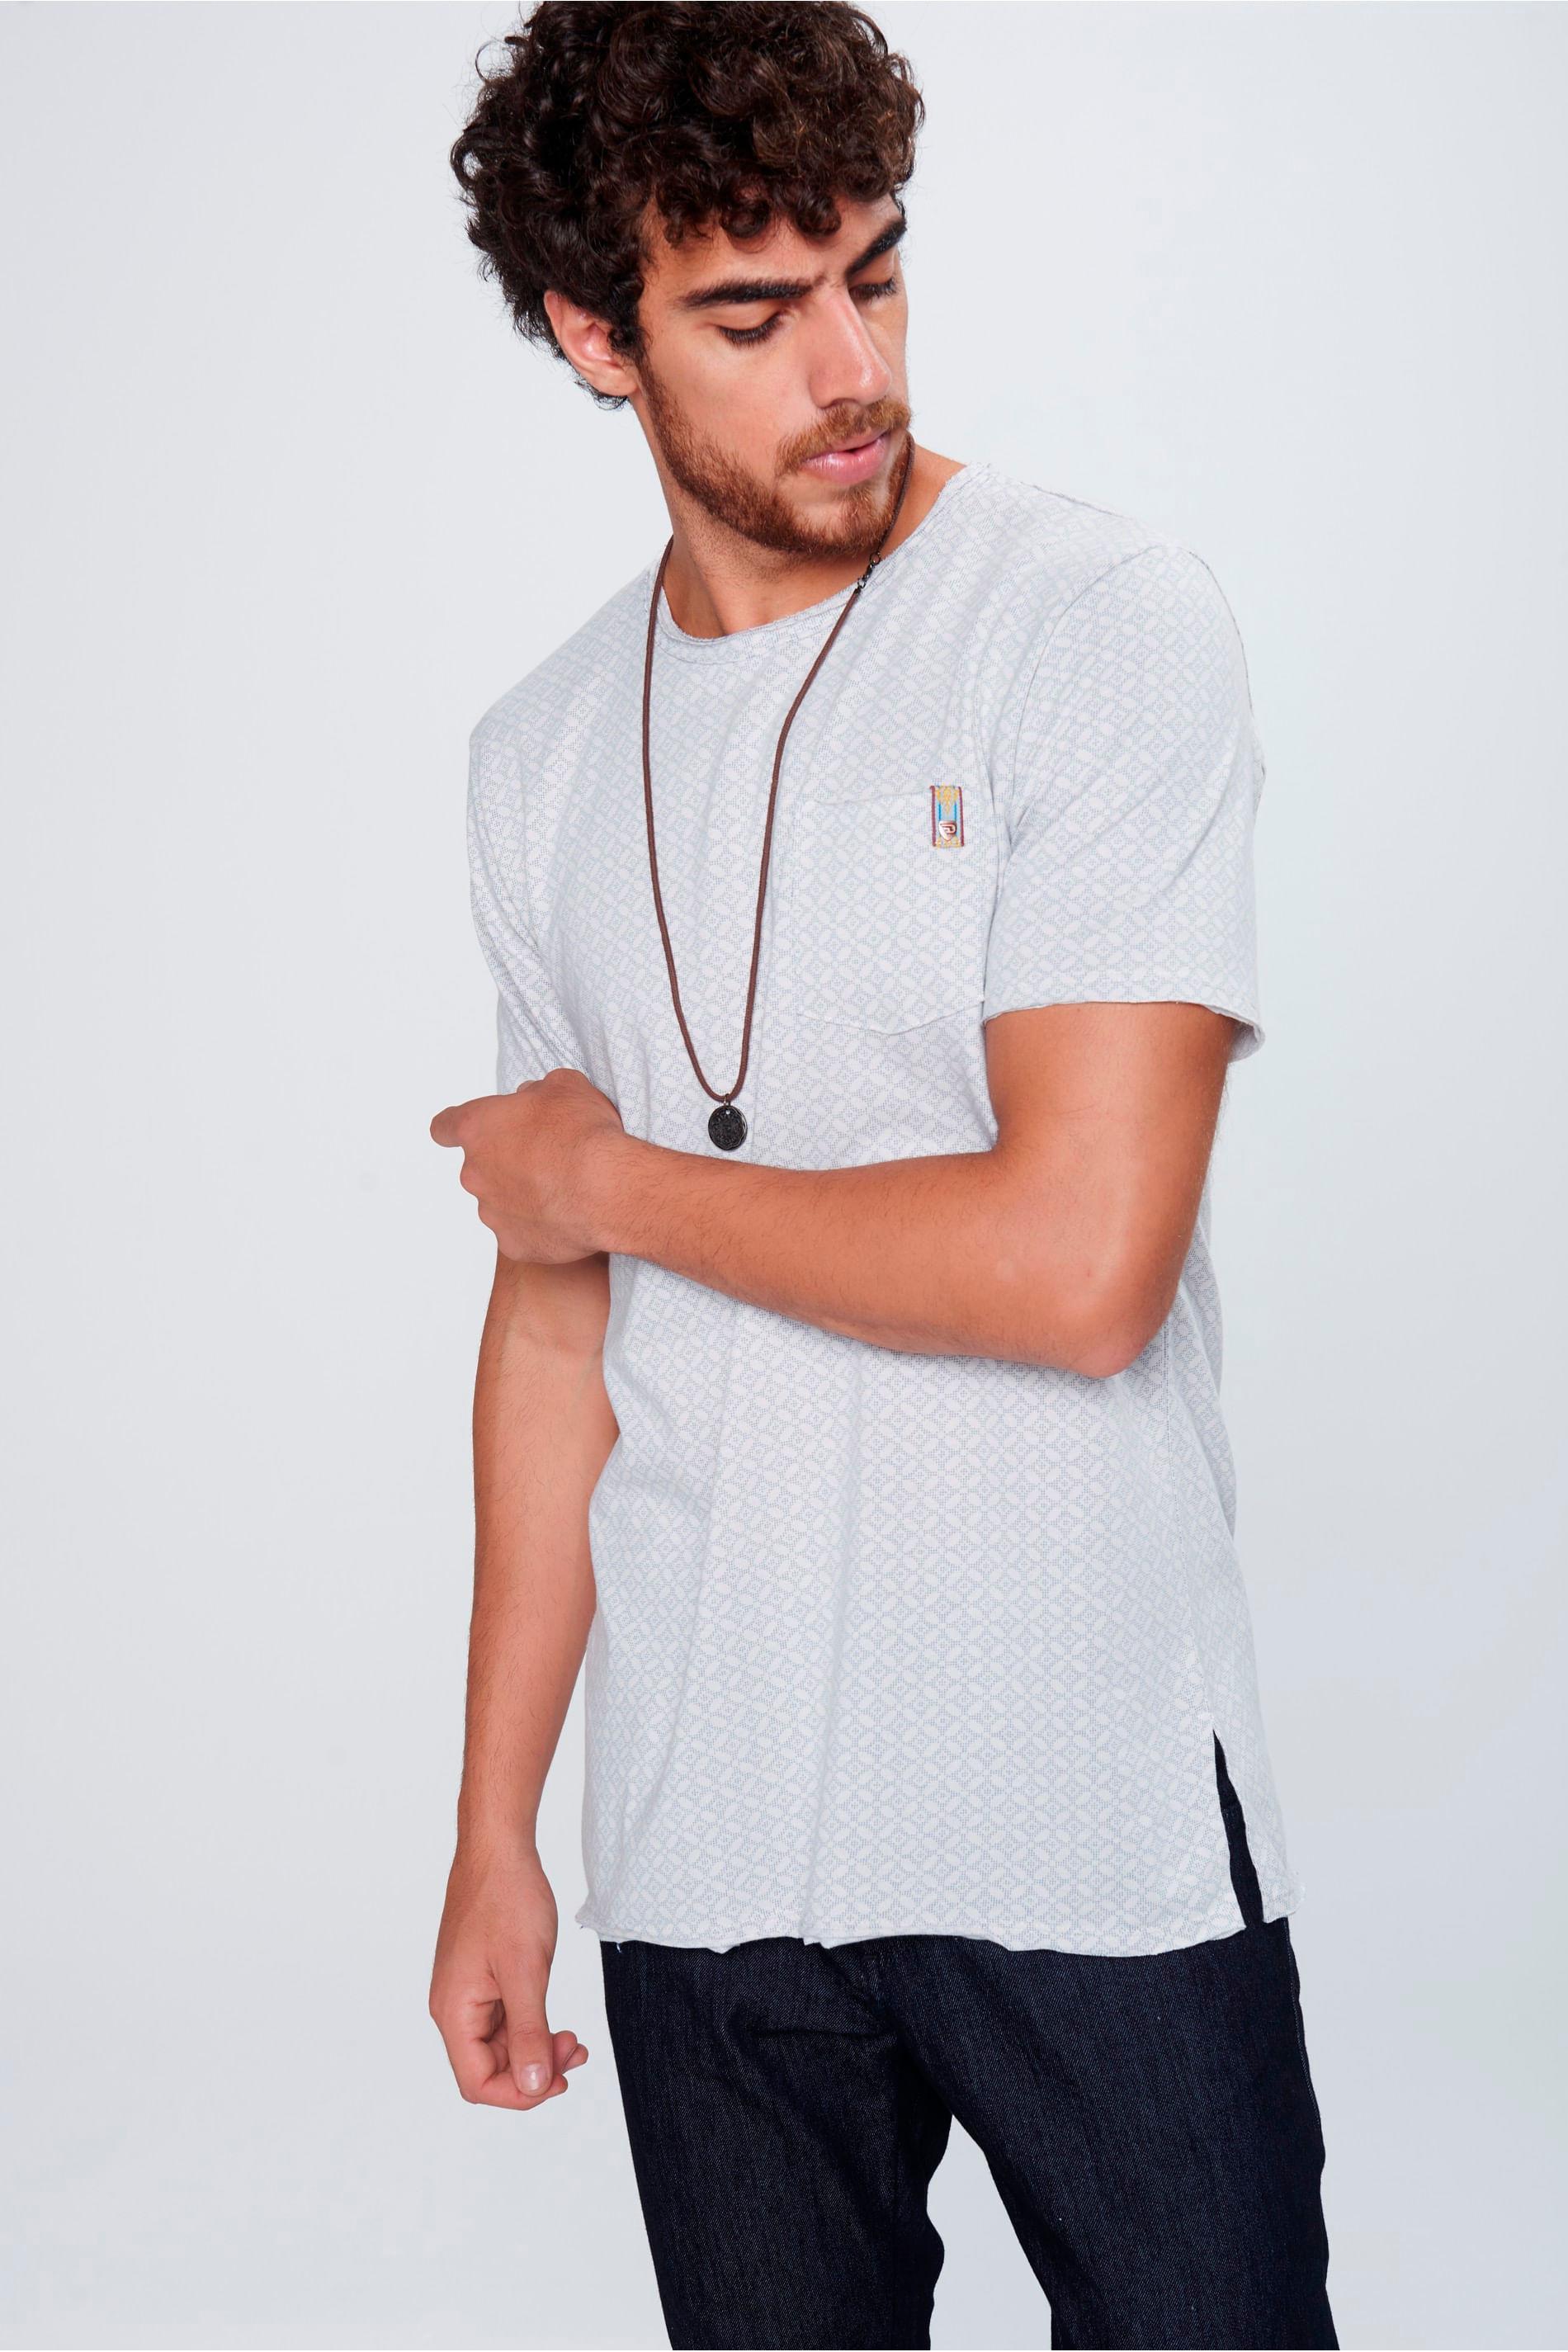 Camiseta Long Line Masculina - Damyller 0c4b4931f1a